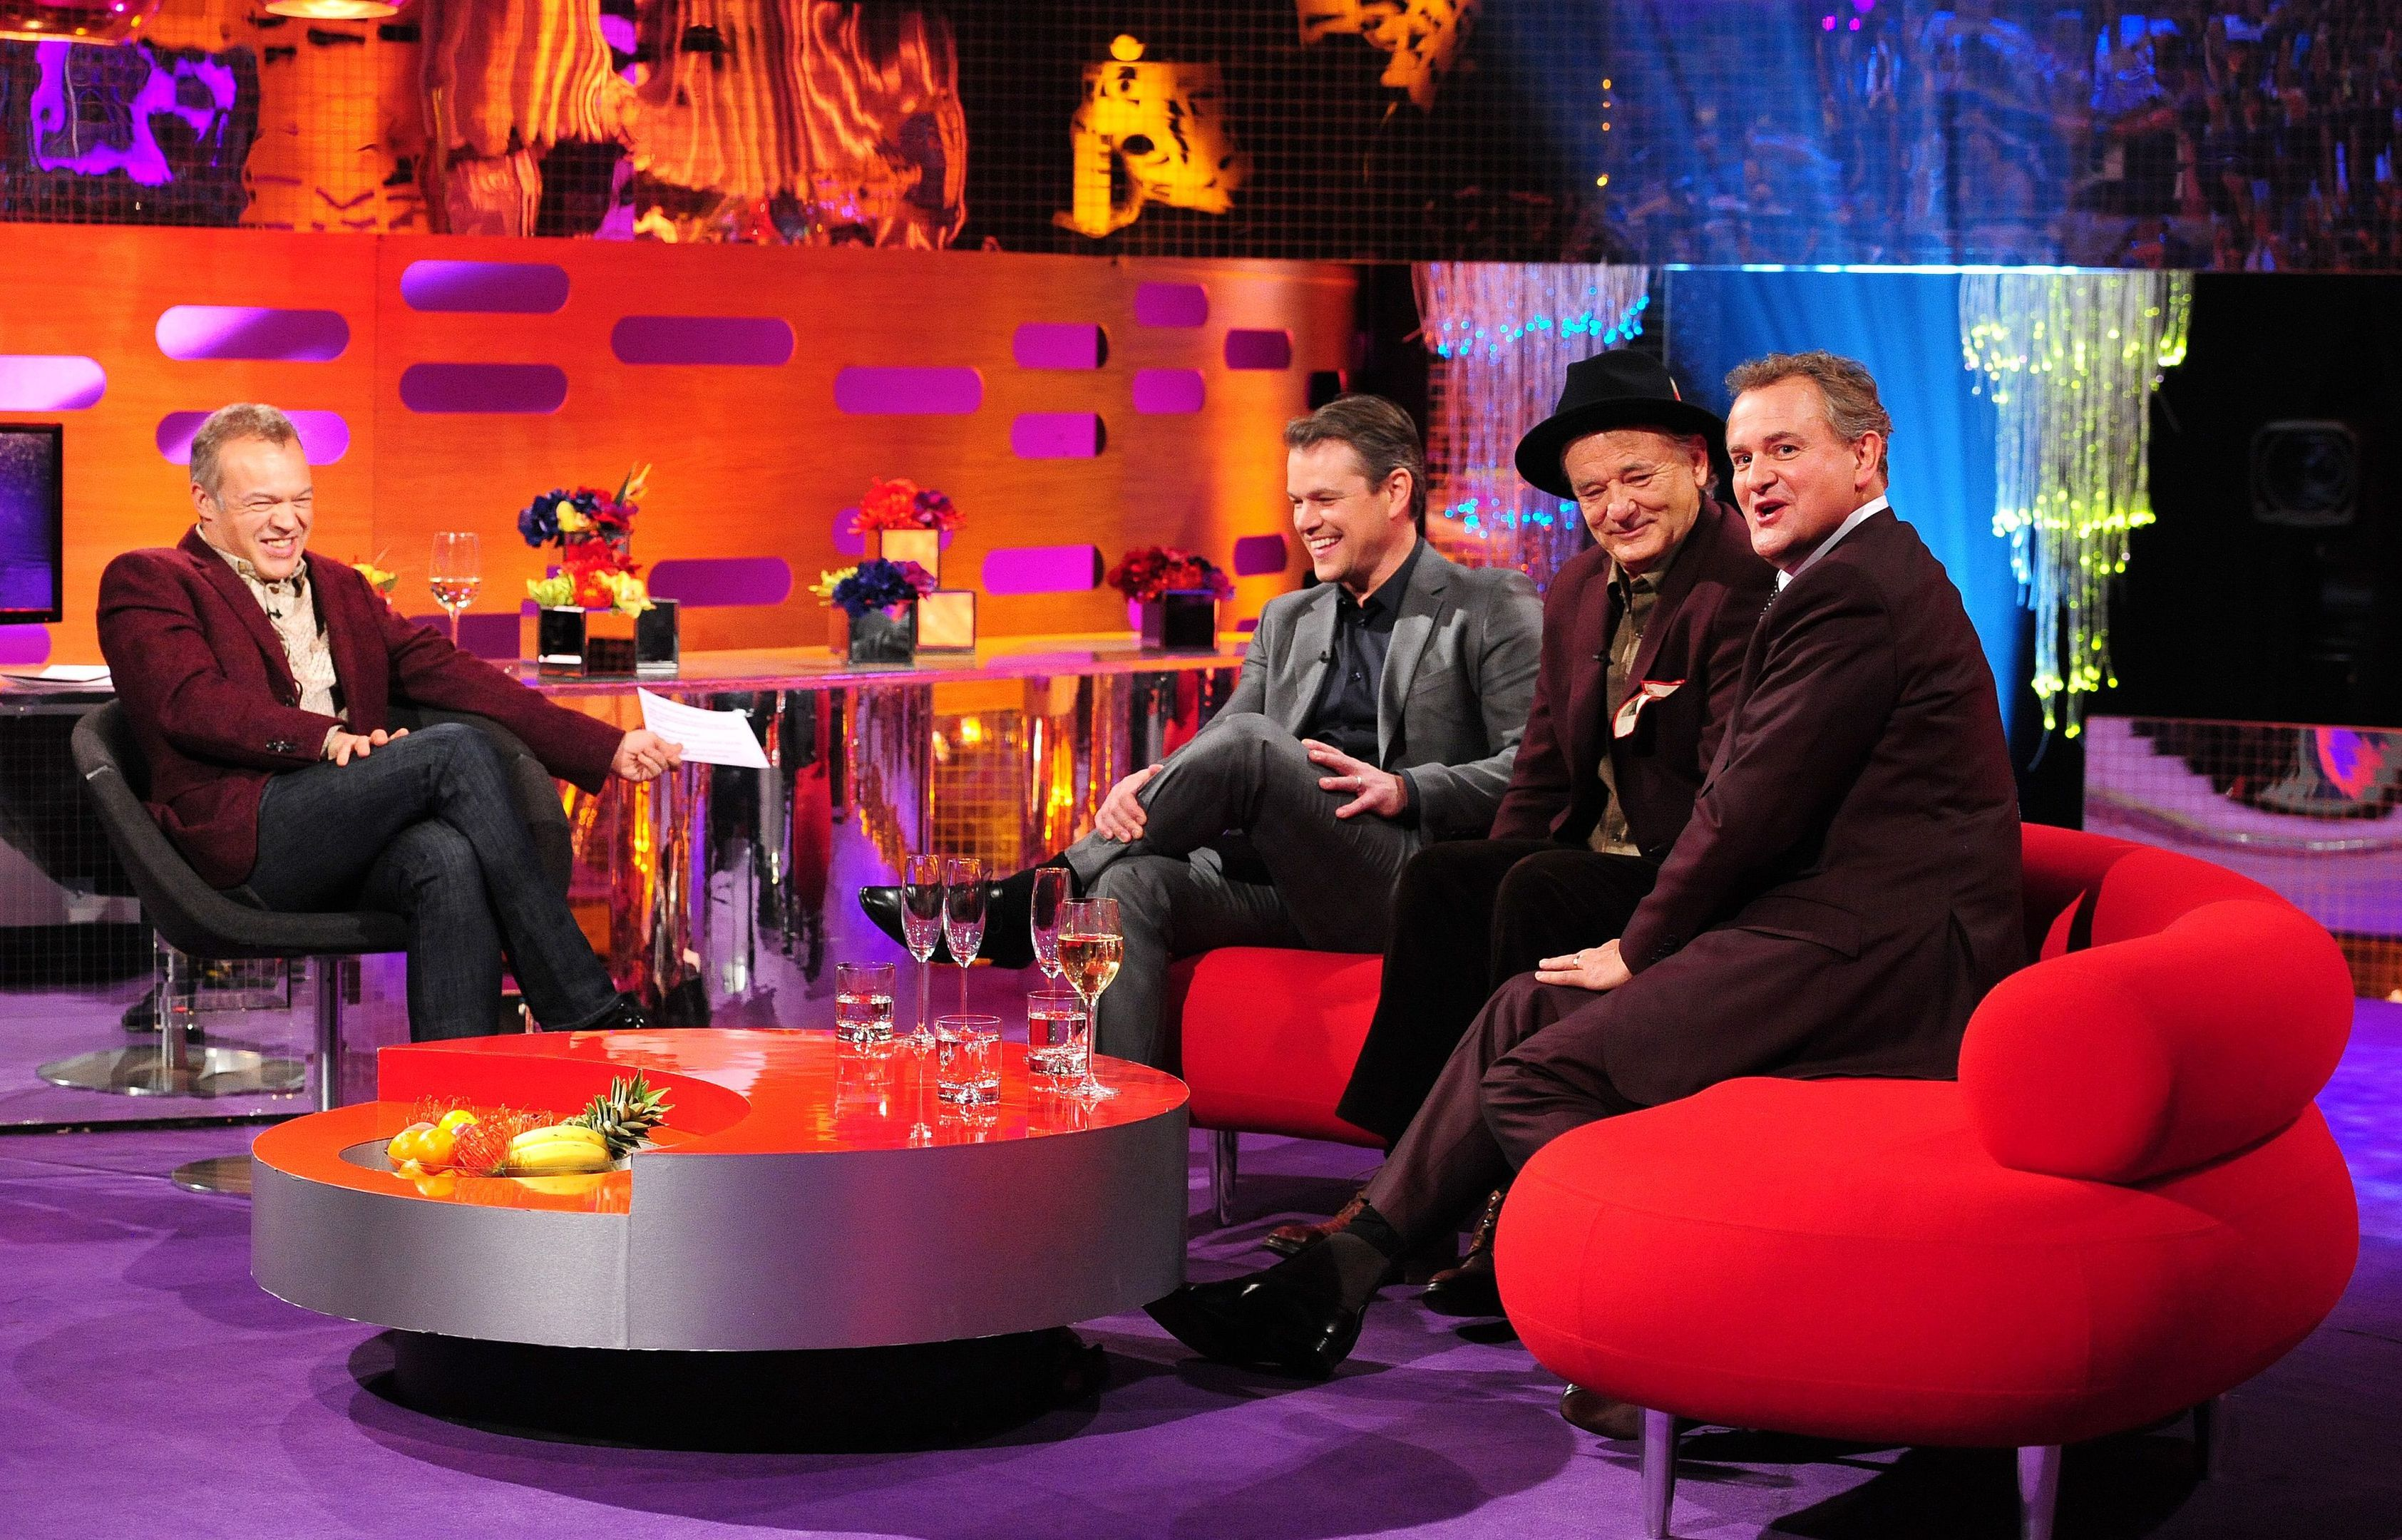 (Left - right) Host Graham Norton, Matt Damon, Bill Murray and Hugh Bonneville during filming of the Graham Norton Show, at the London Studios (BBC)